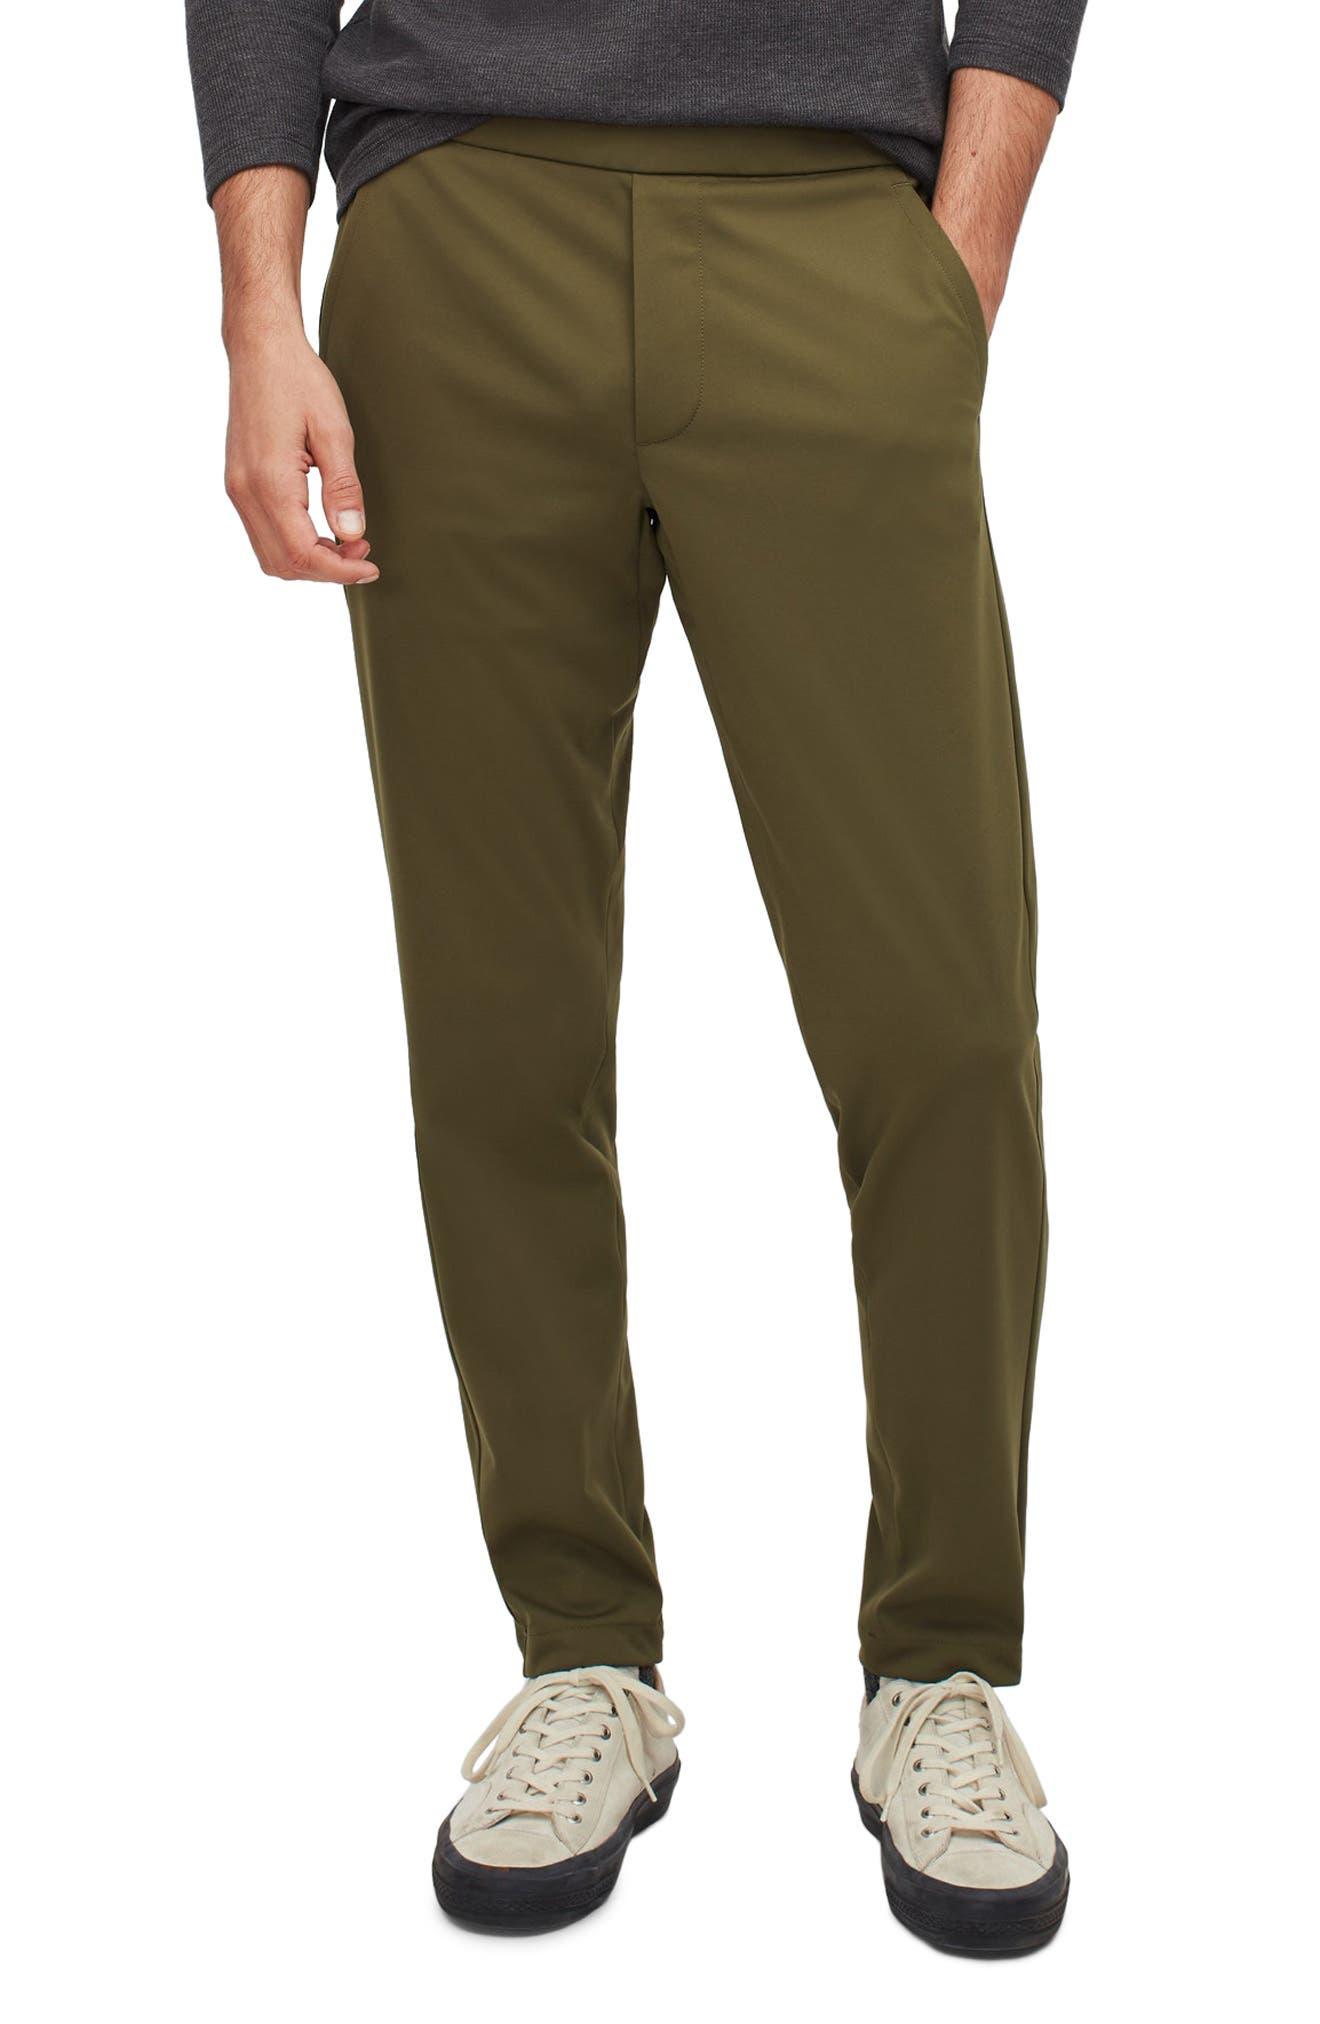 The Wfhq Pants